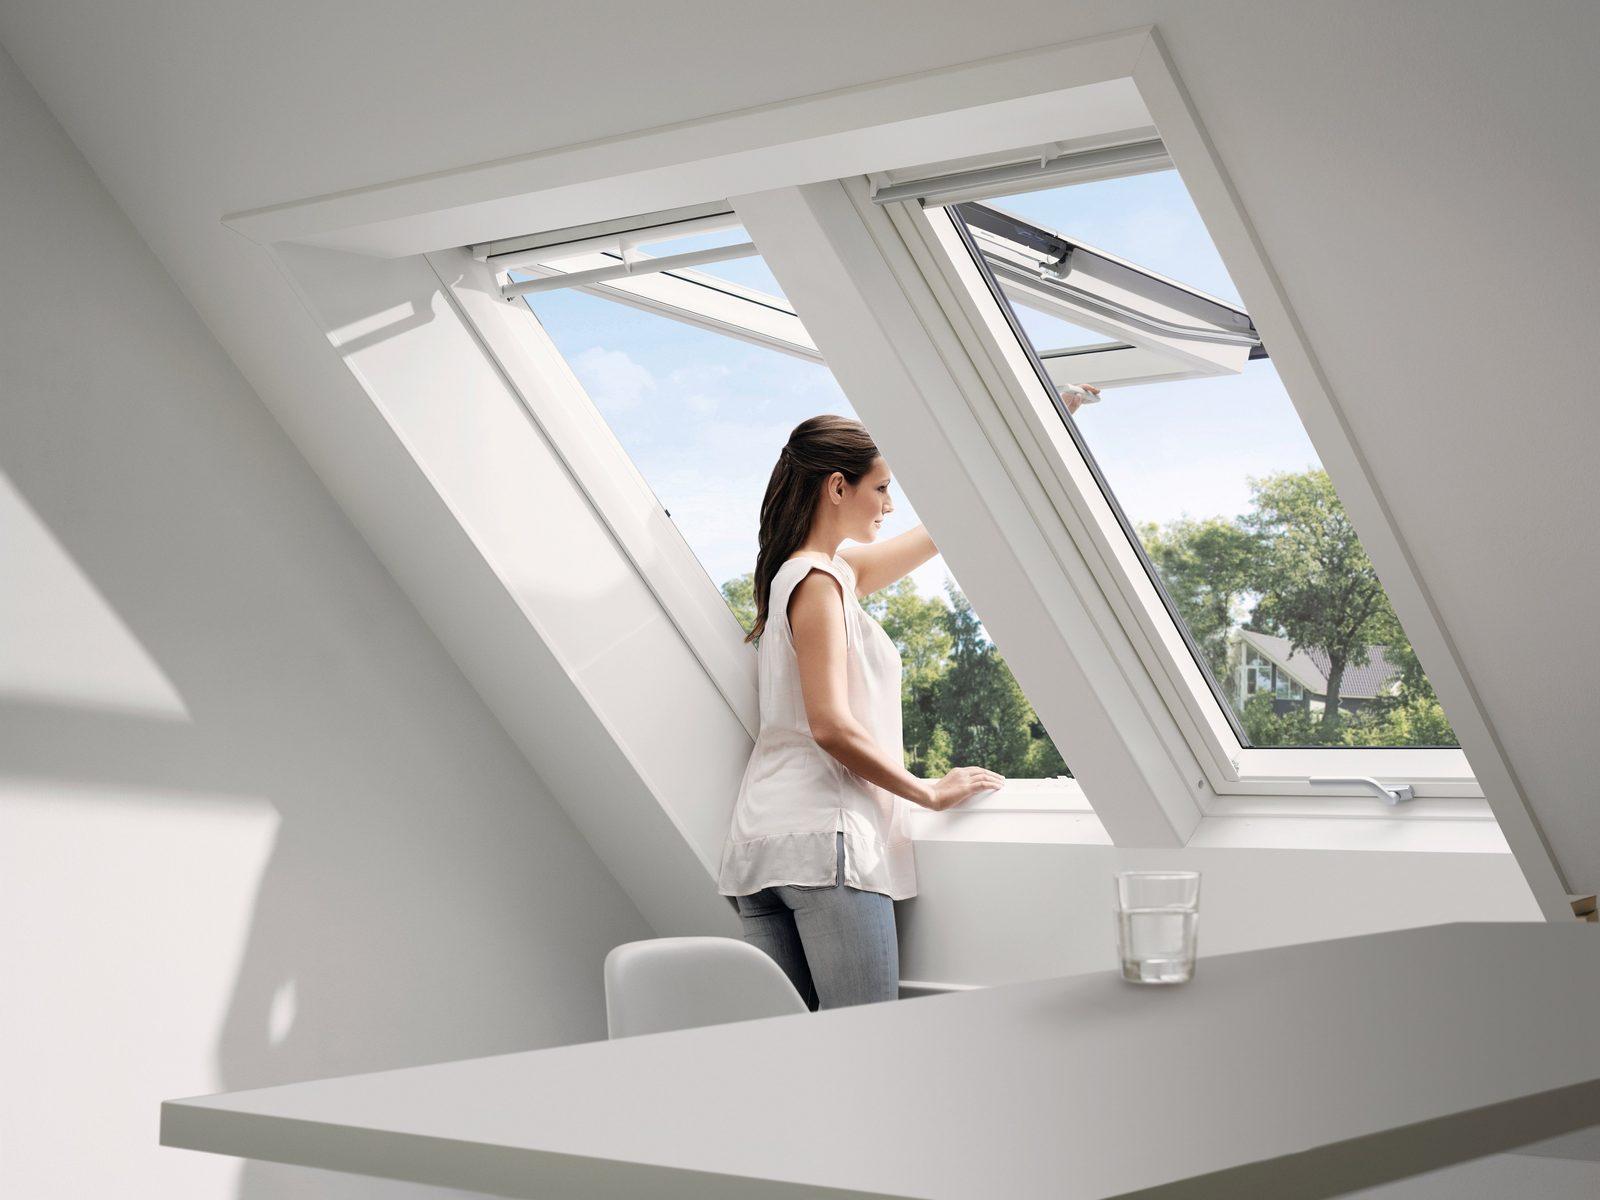 VELUX Dachfenster »GPU SK08«, BxH: 114x140 cm